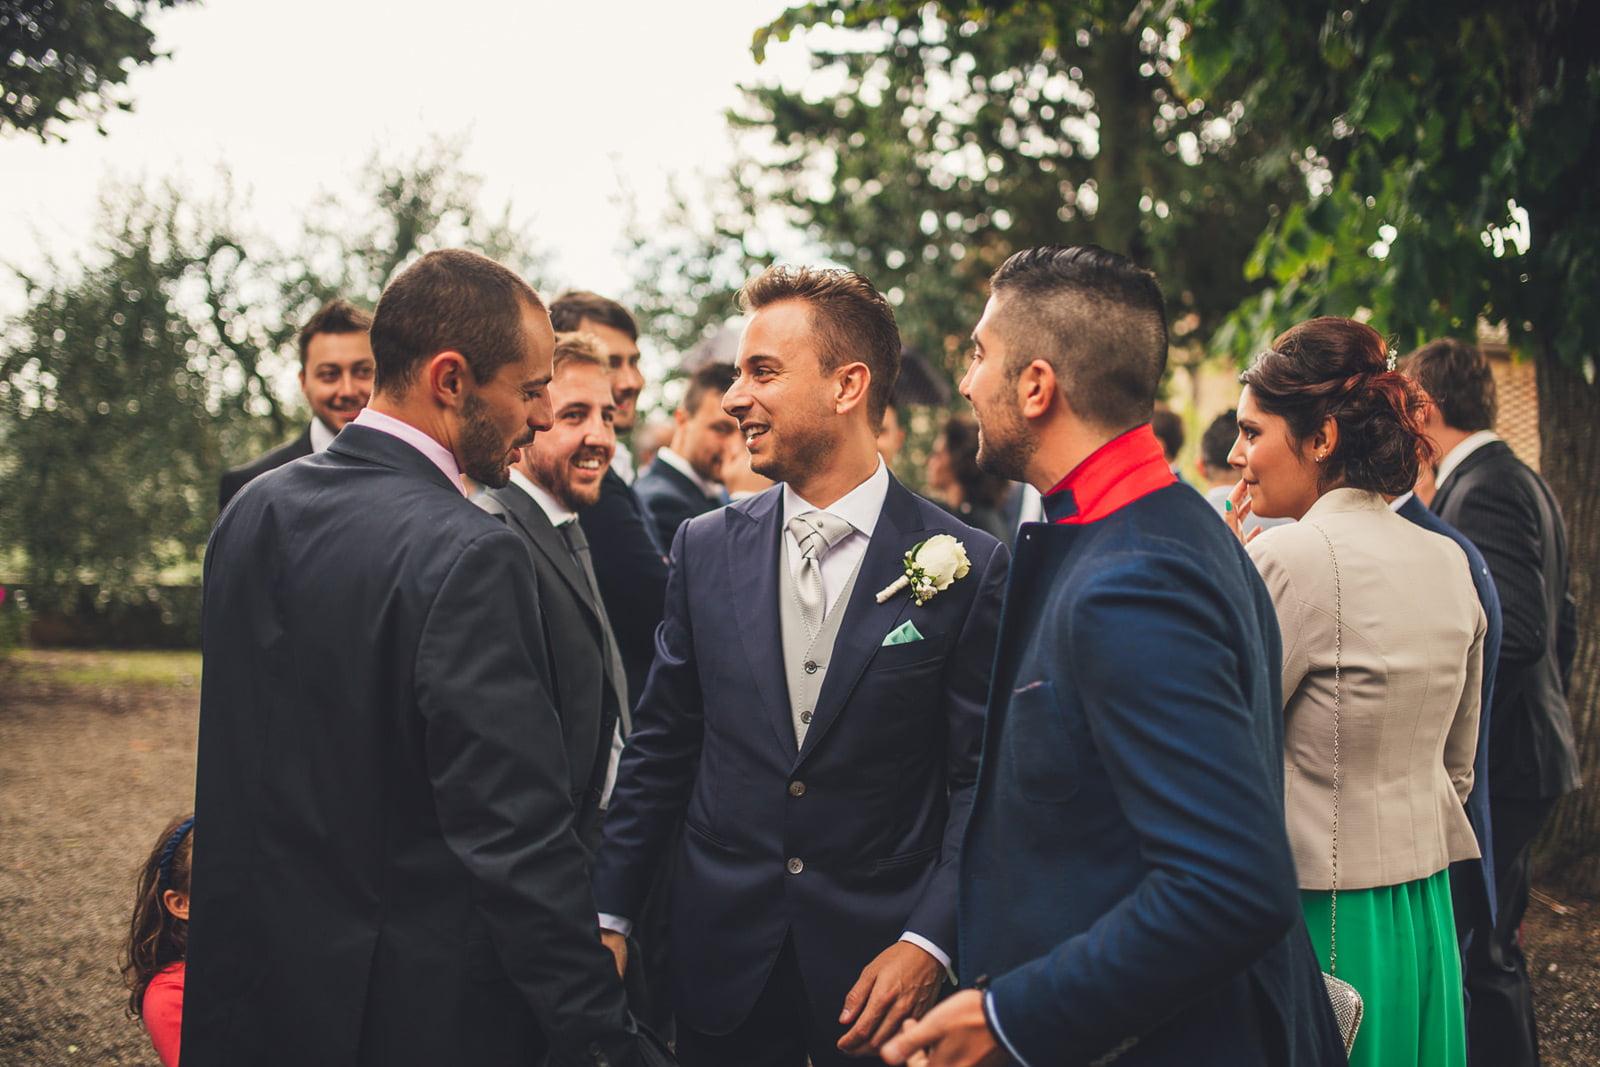 025-wedding-florence-palazzo-borghese